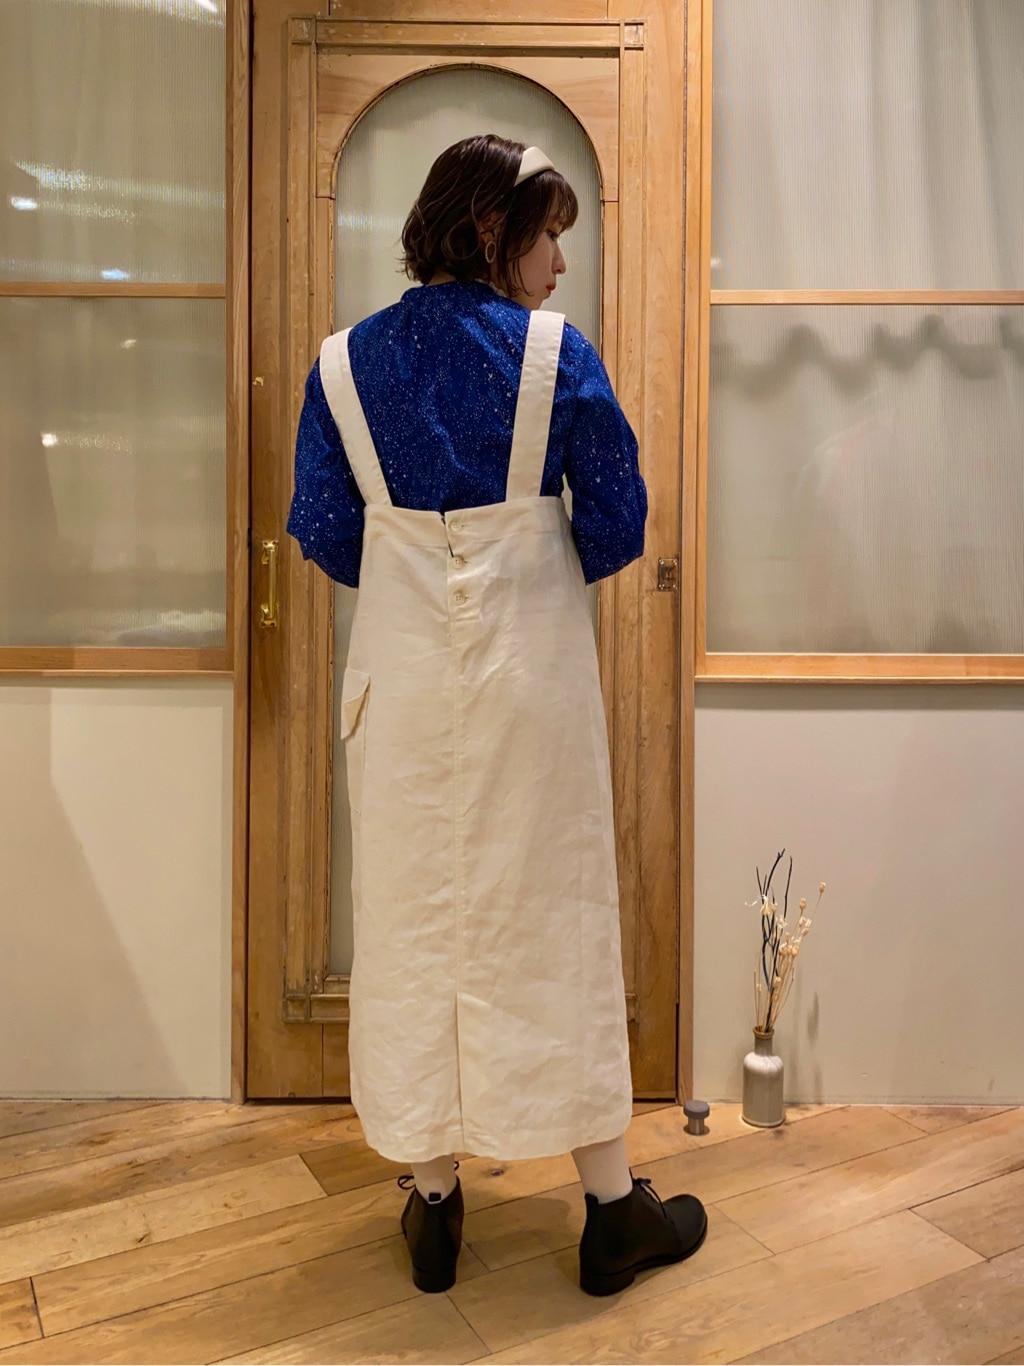 bulle de savon 新宿ミロード 身長:157cm 2021.01.15